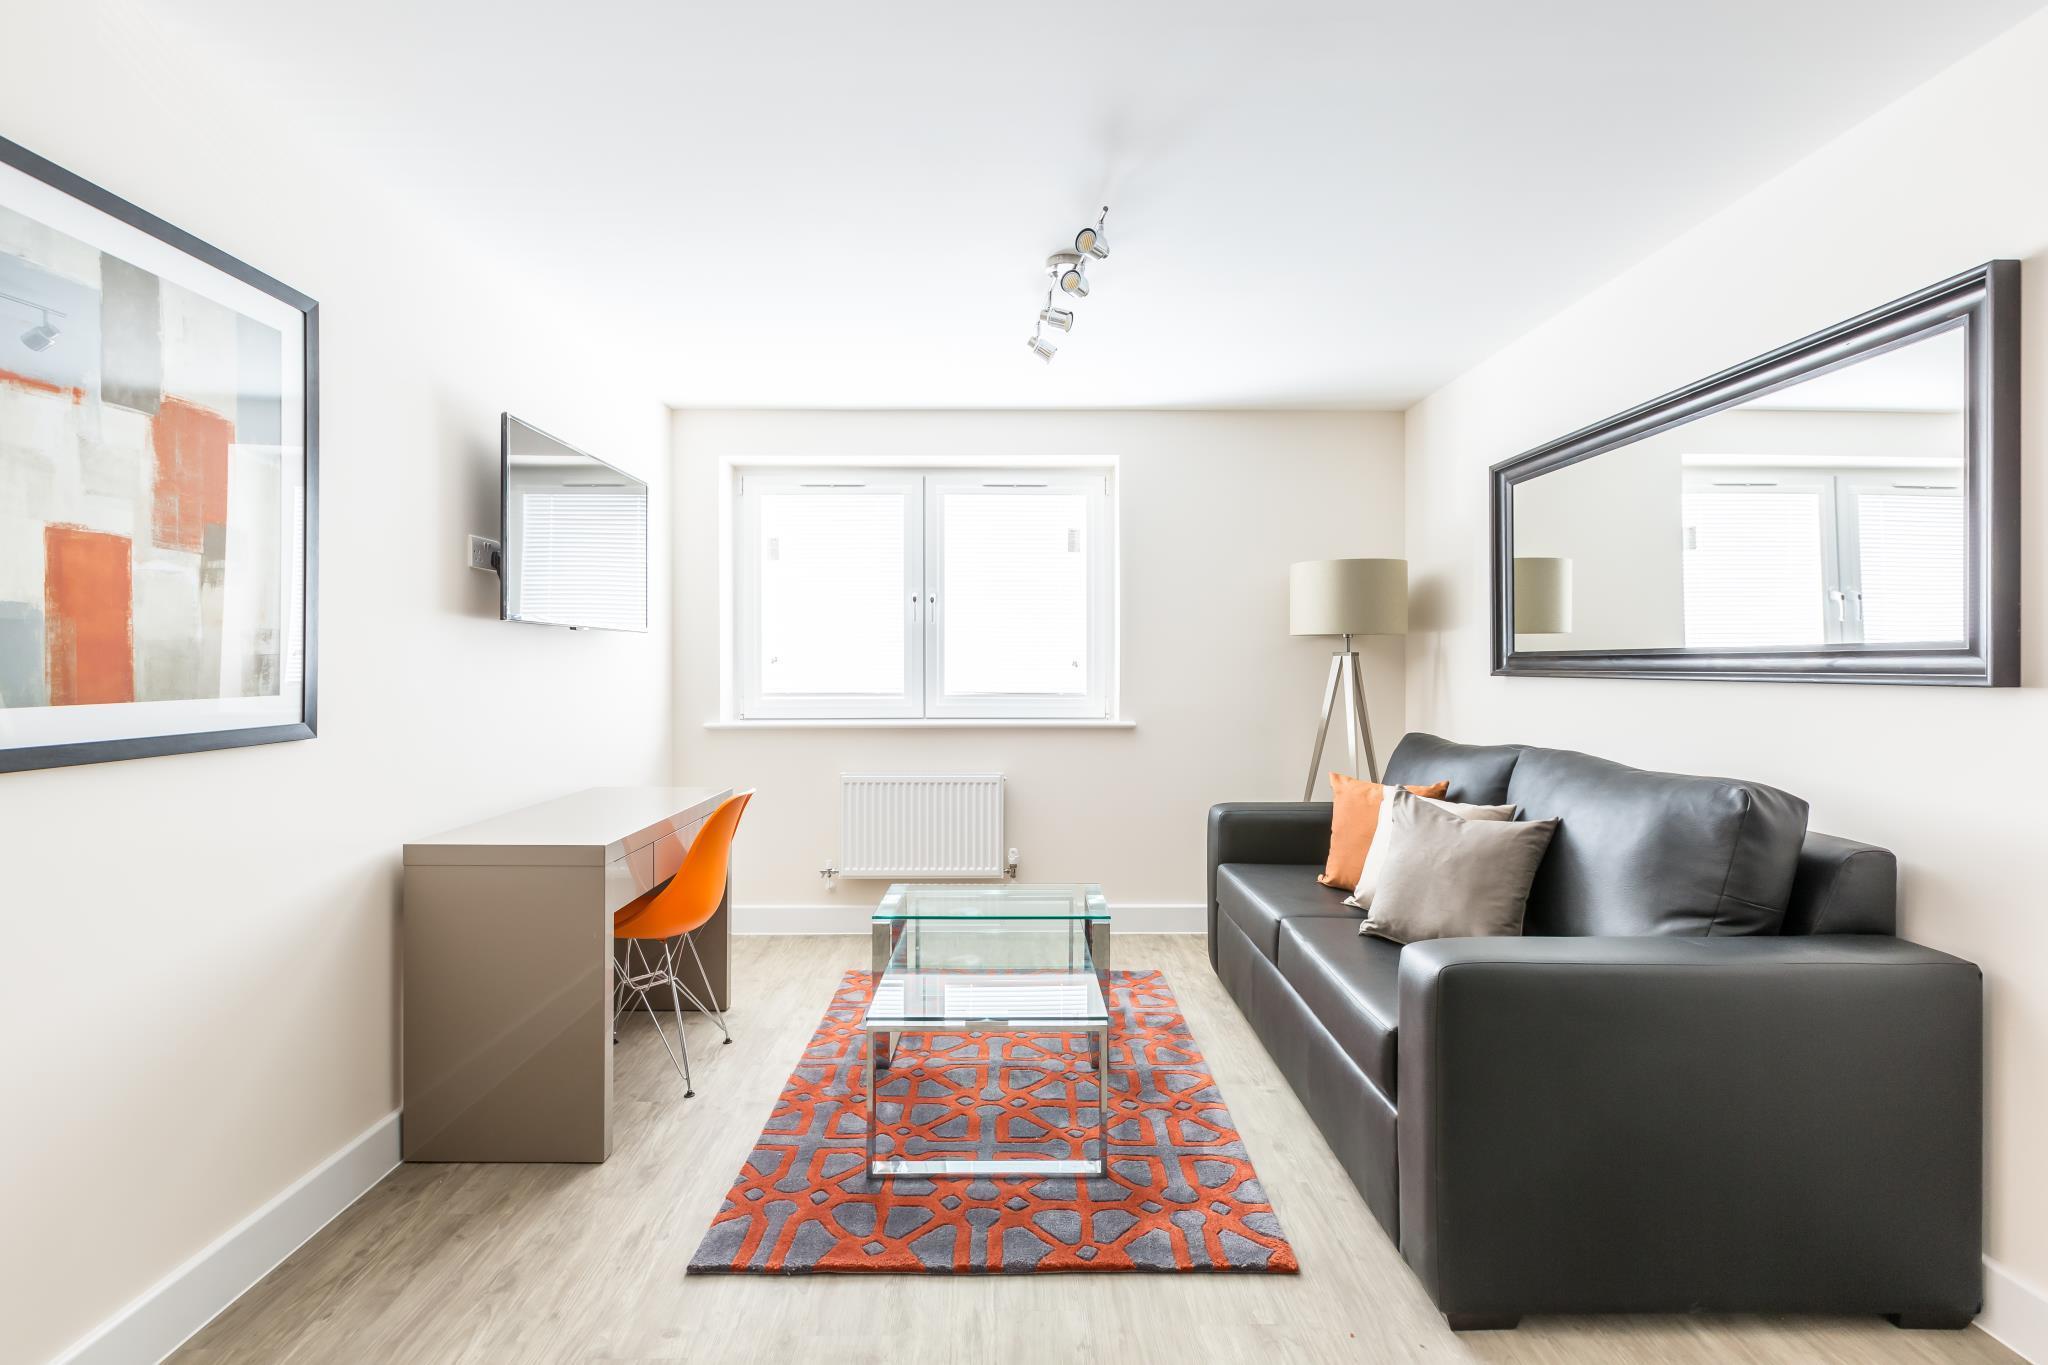 HOF - Solstice House Apartments, Hampshire